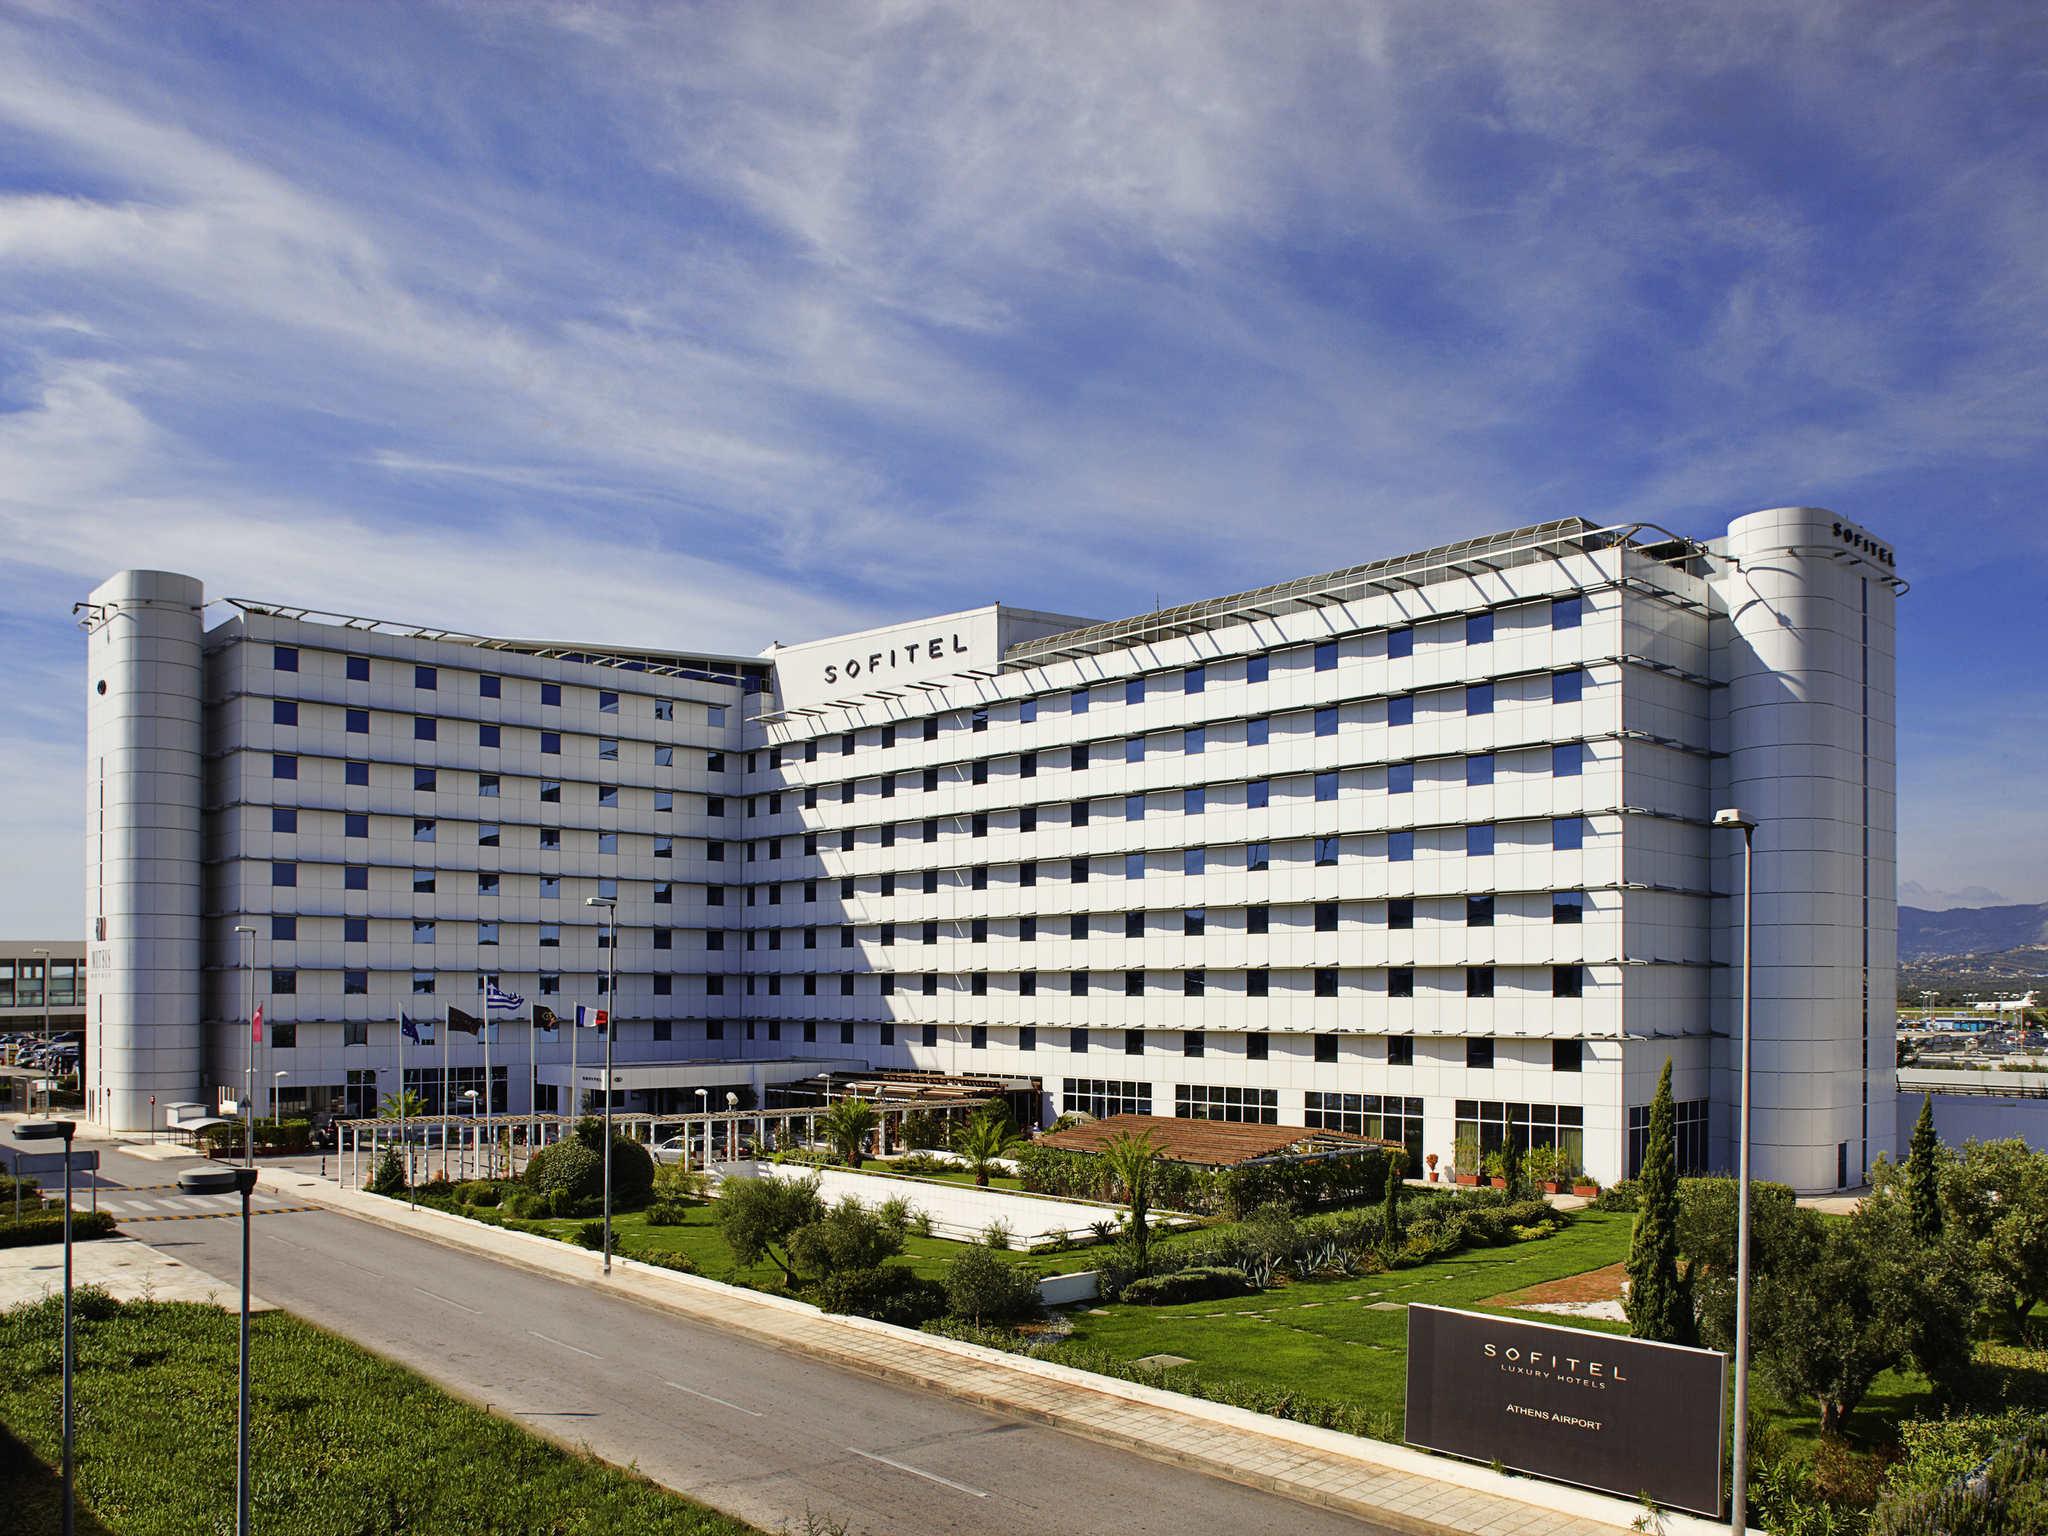 Hotel – Sofitel Athens Airport